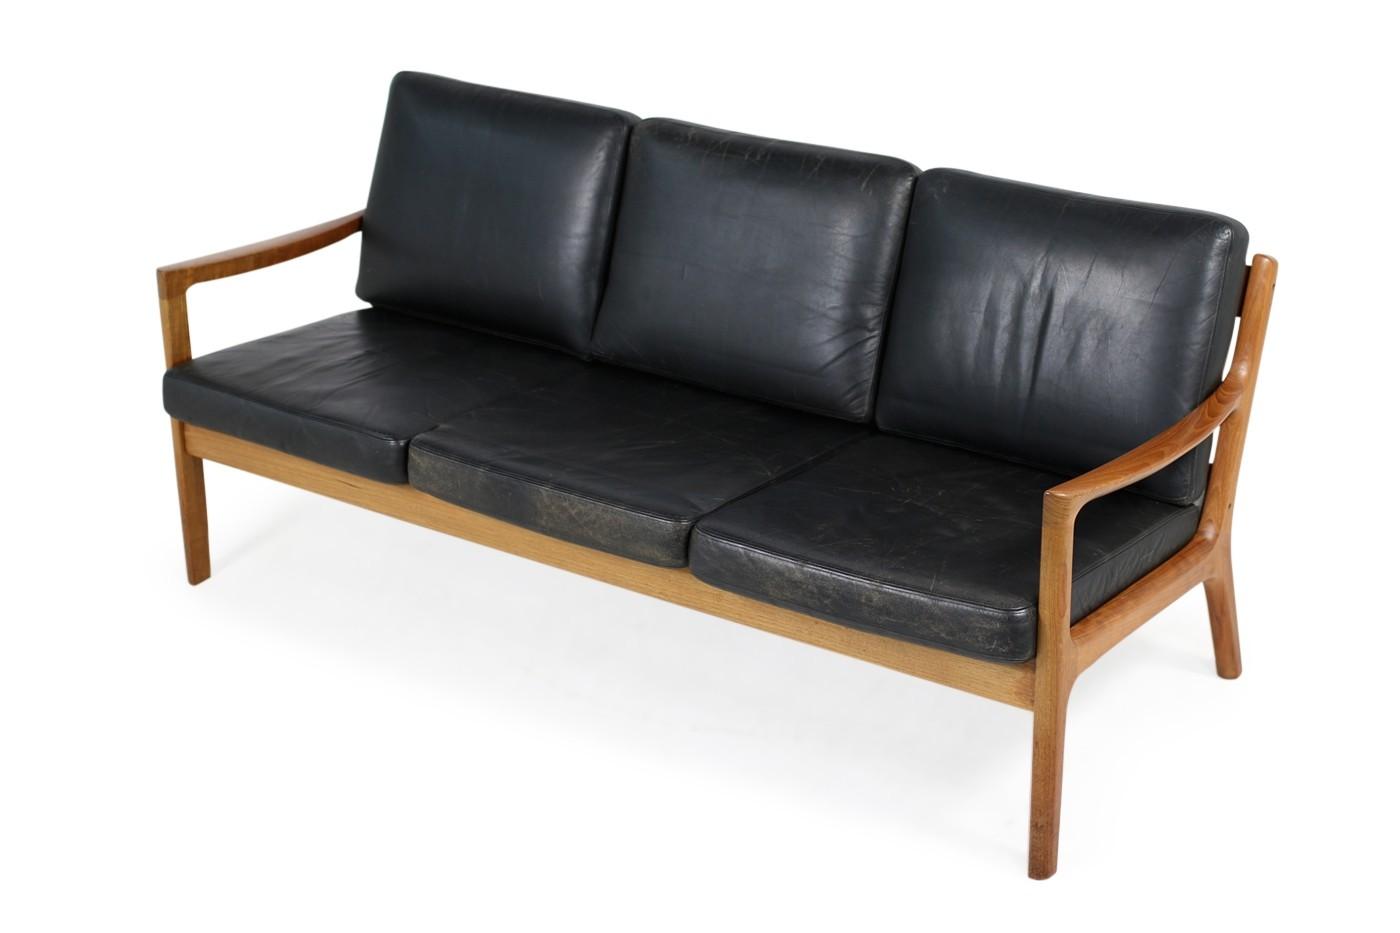 1960s Danish Modern Vintage Sofa by Ole Wanscher in Teak & Black Leather